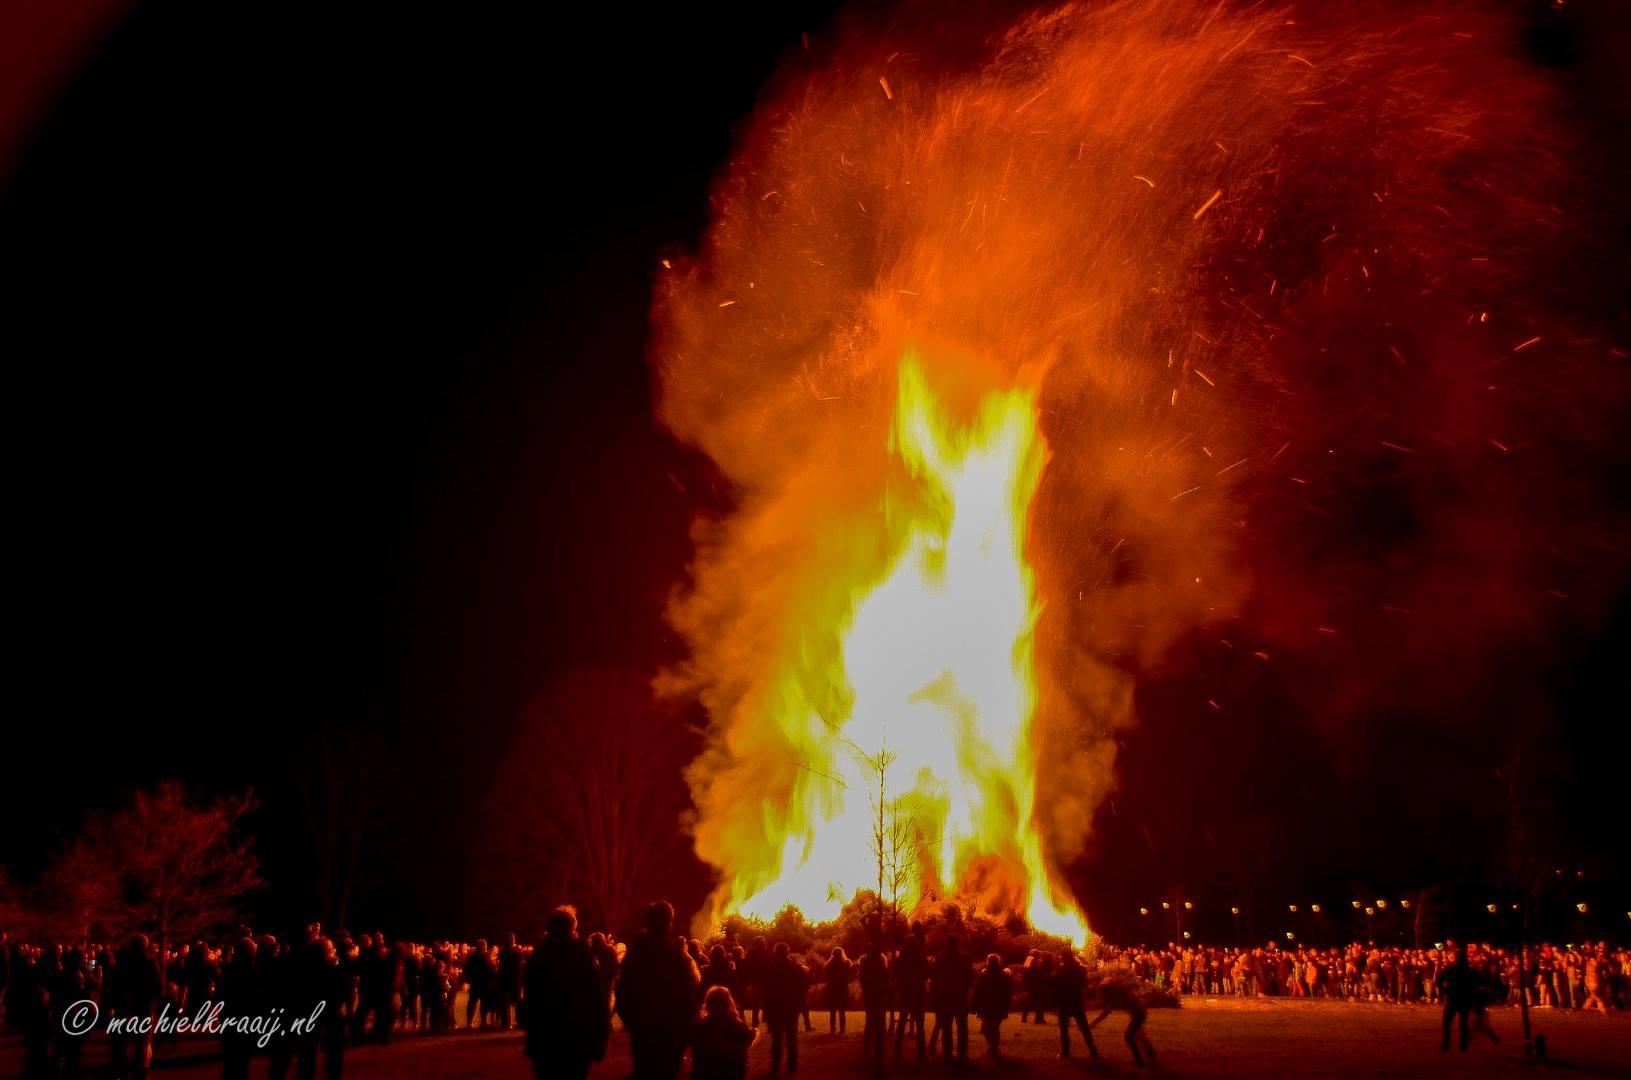 Kerstboom verbranding in Velsen